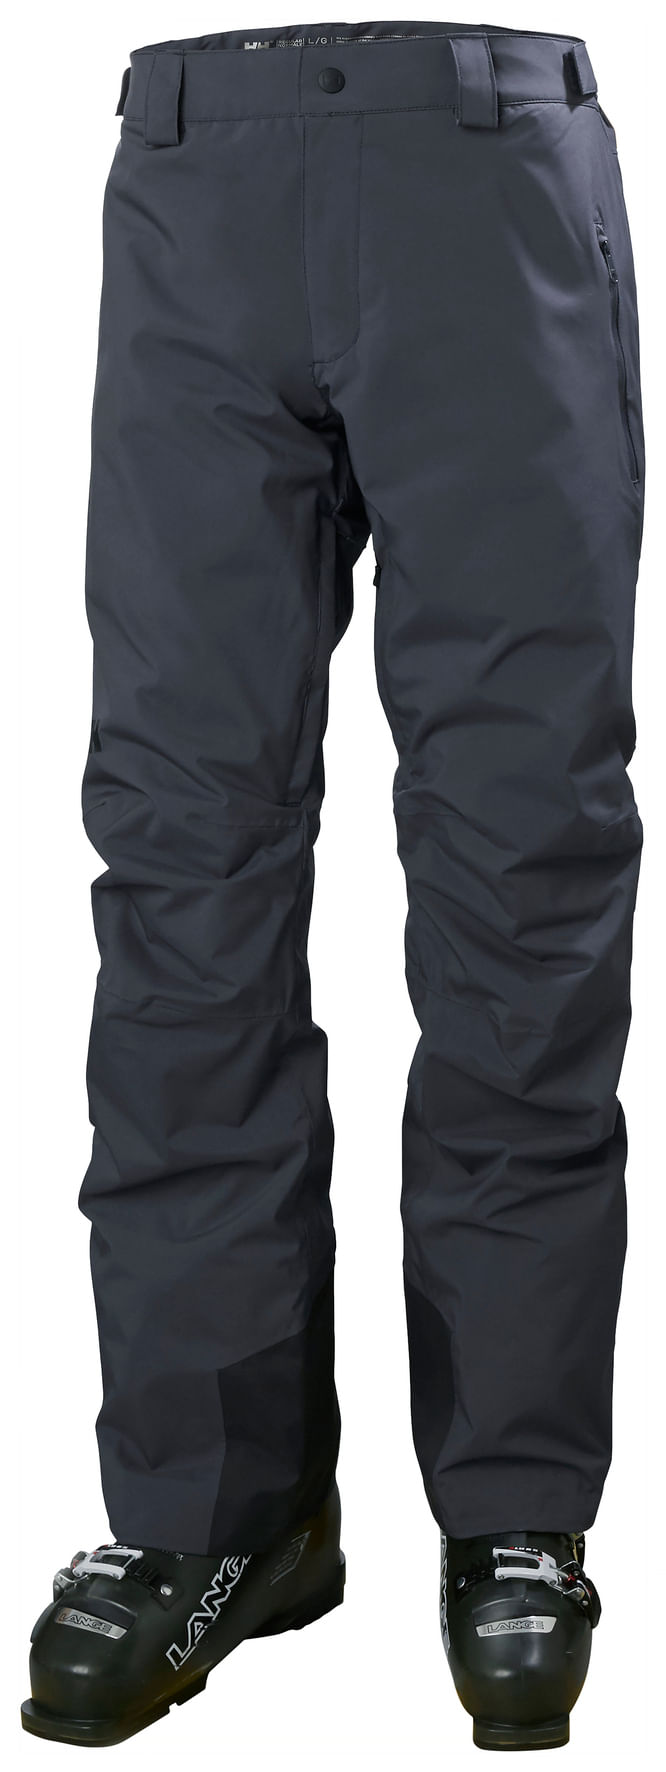 Helly-Hansen-Legendary-Insulated-Pants-2021